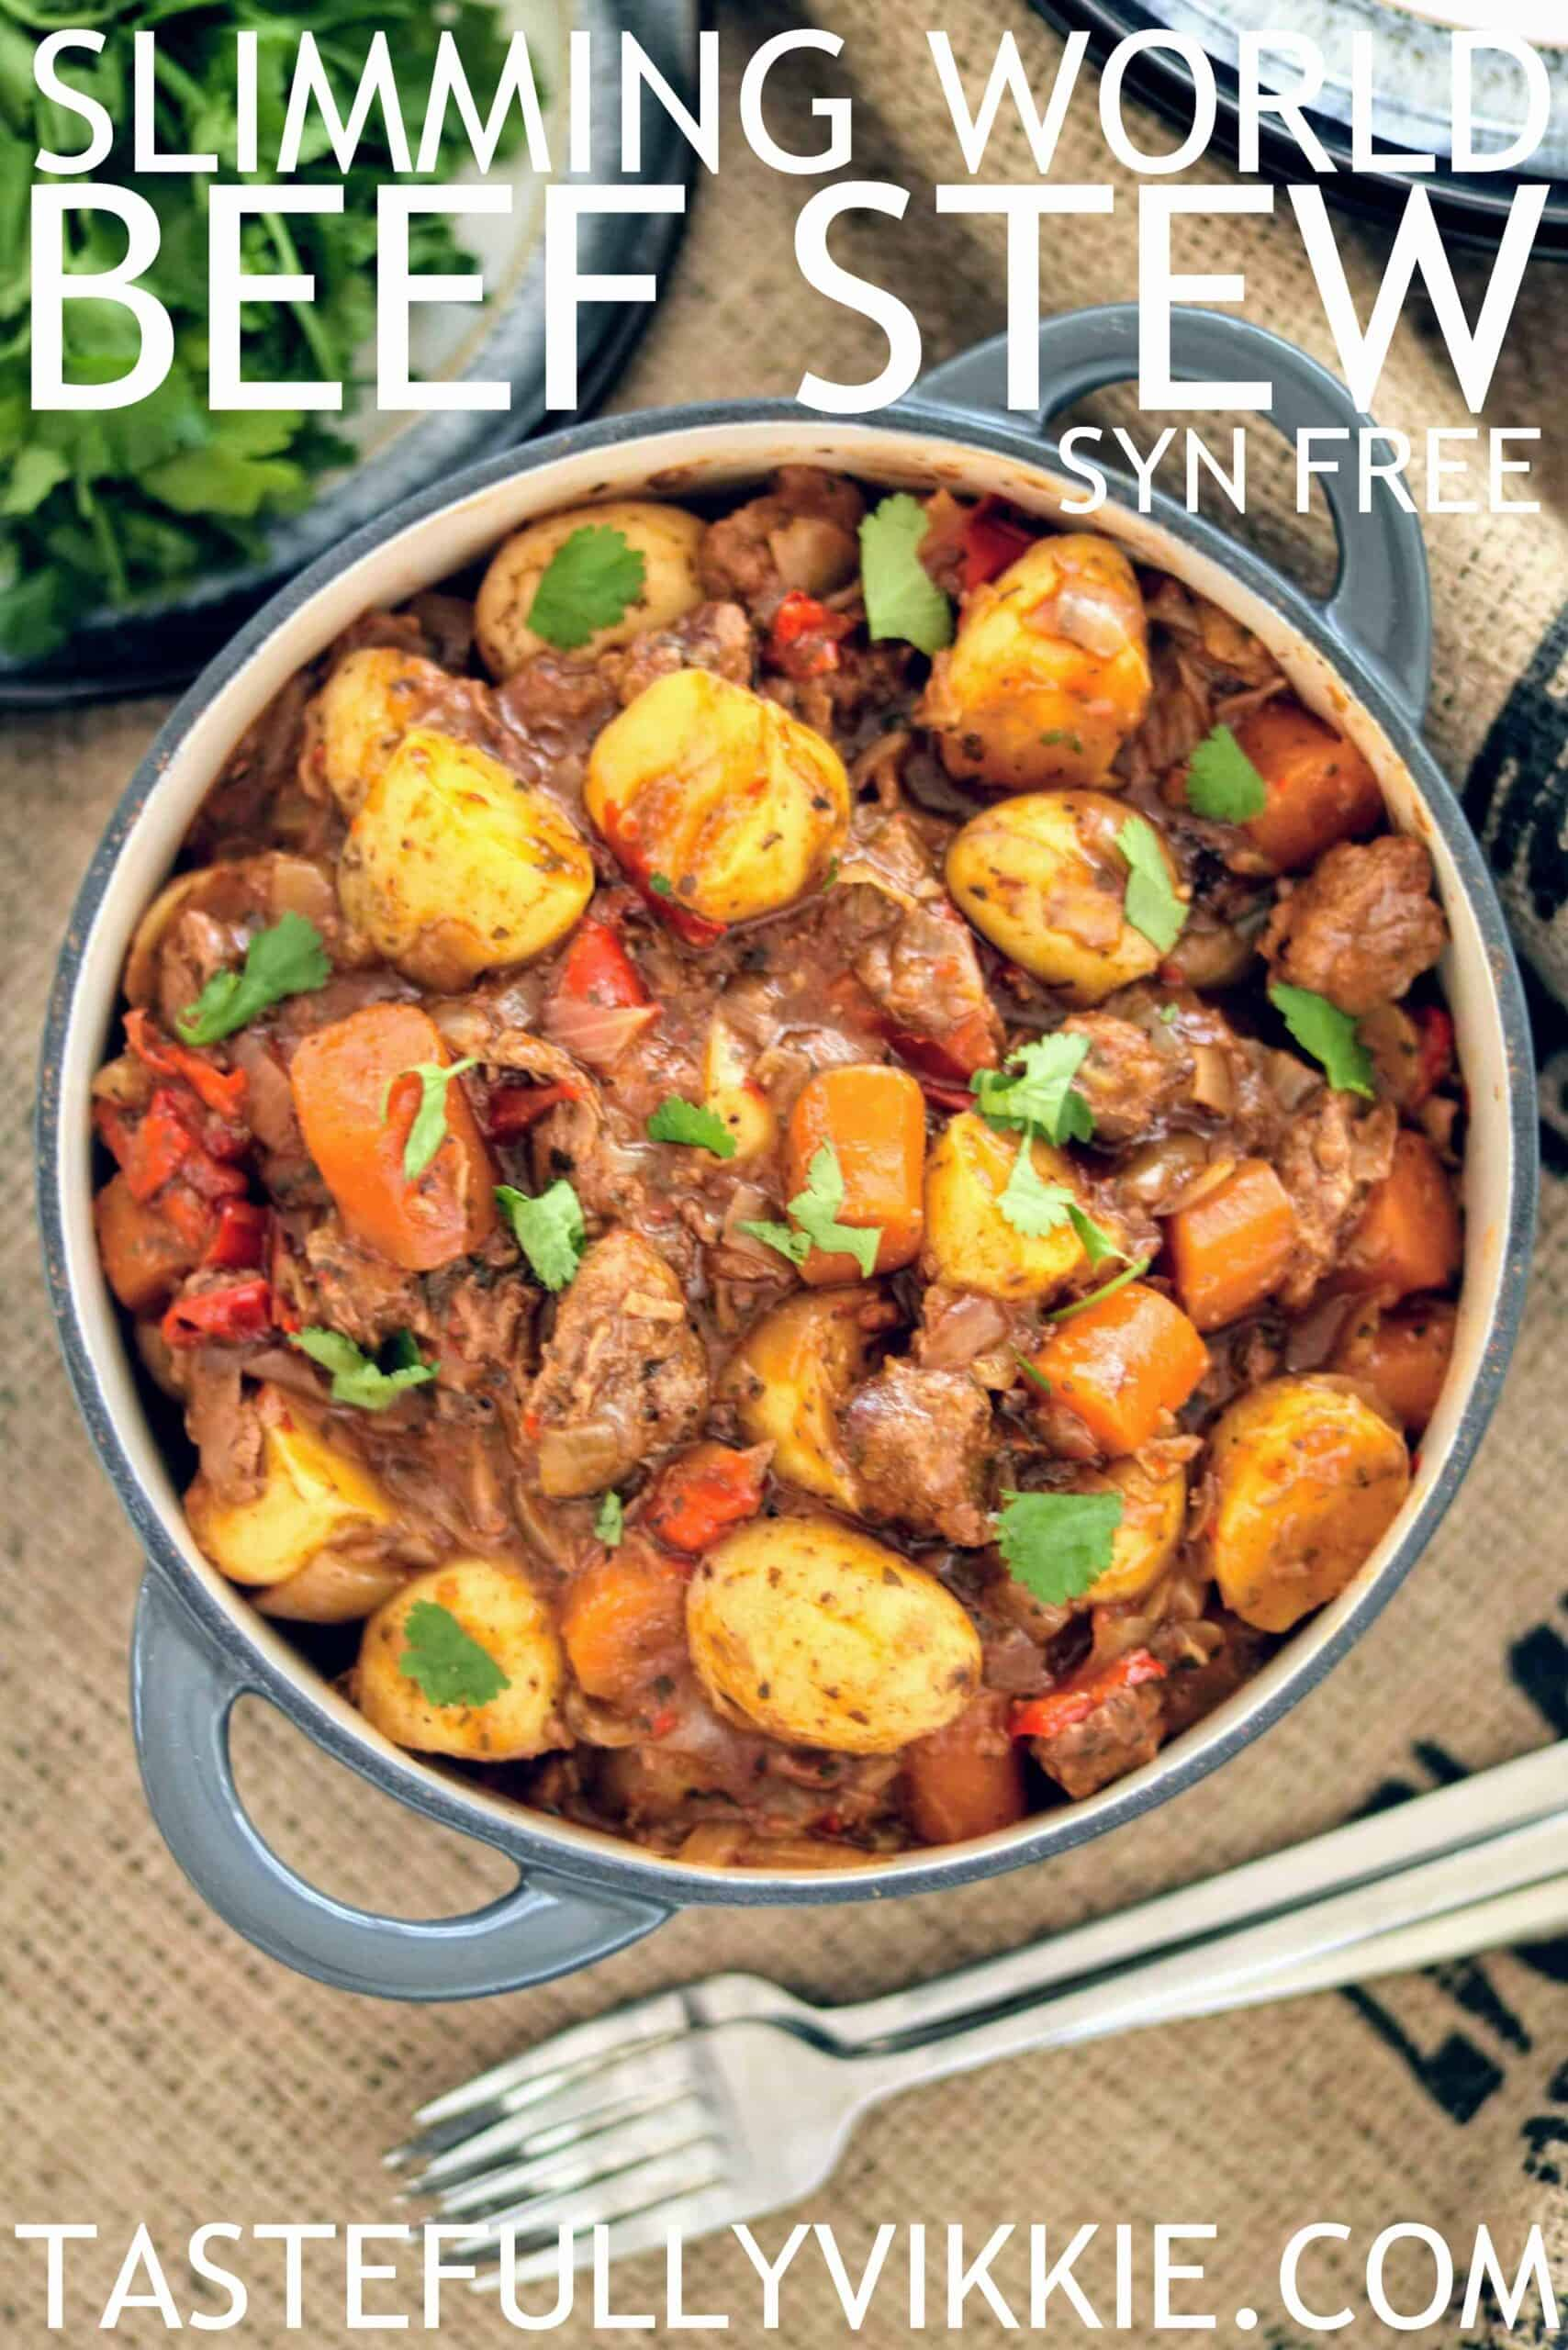 Slimming World Slow Cooker Syn Free Beef Stew Tastefully Vikkie